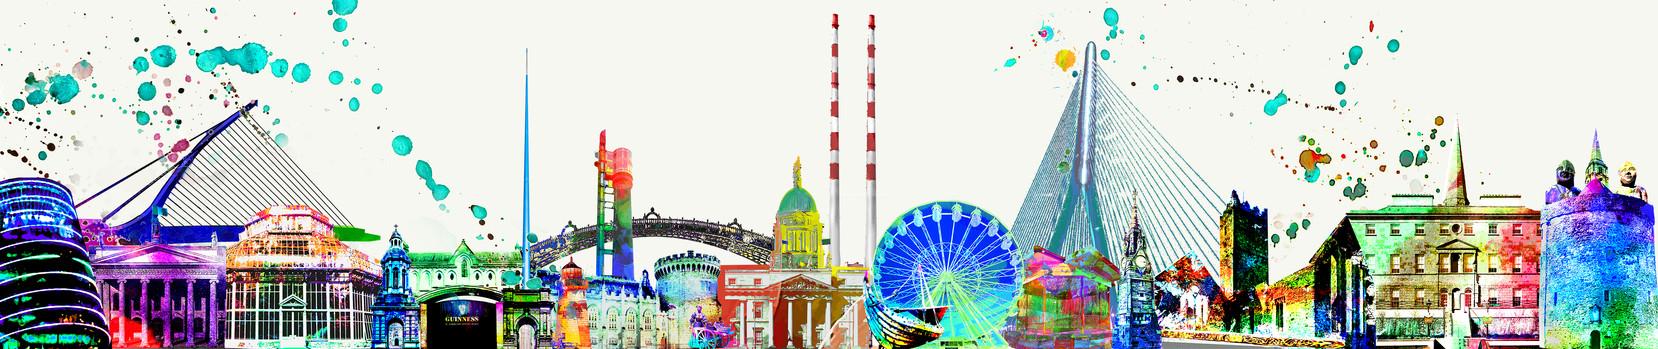 Fair Cities - Dublin and Waterford